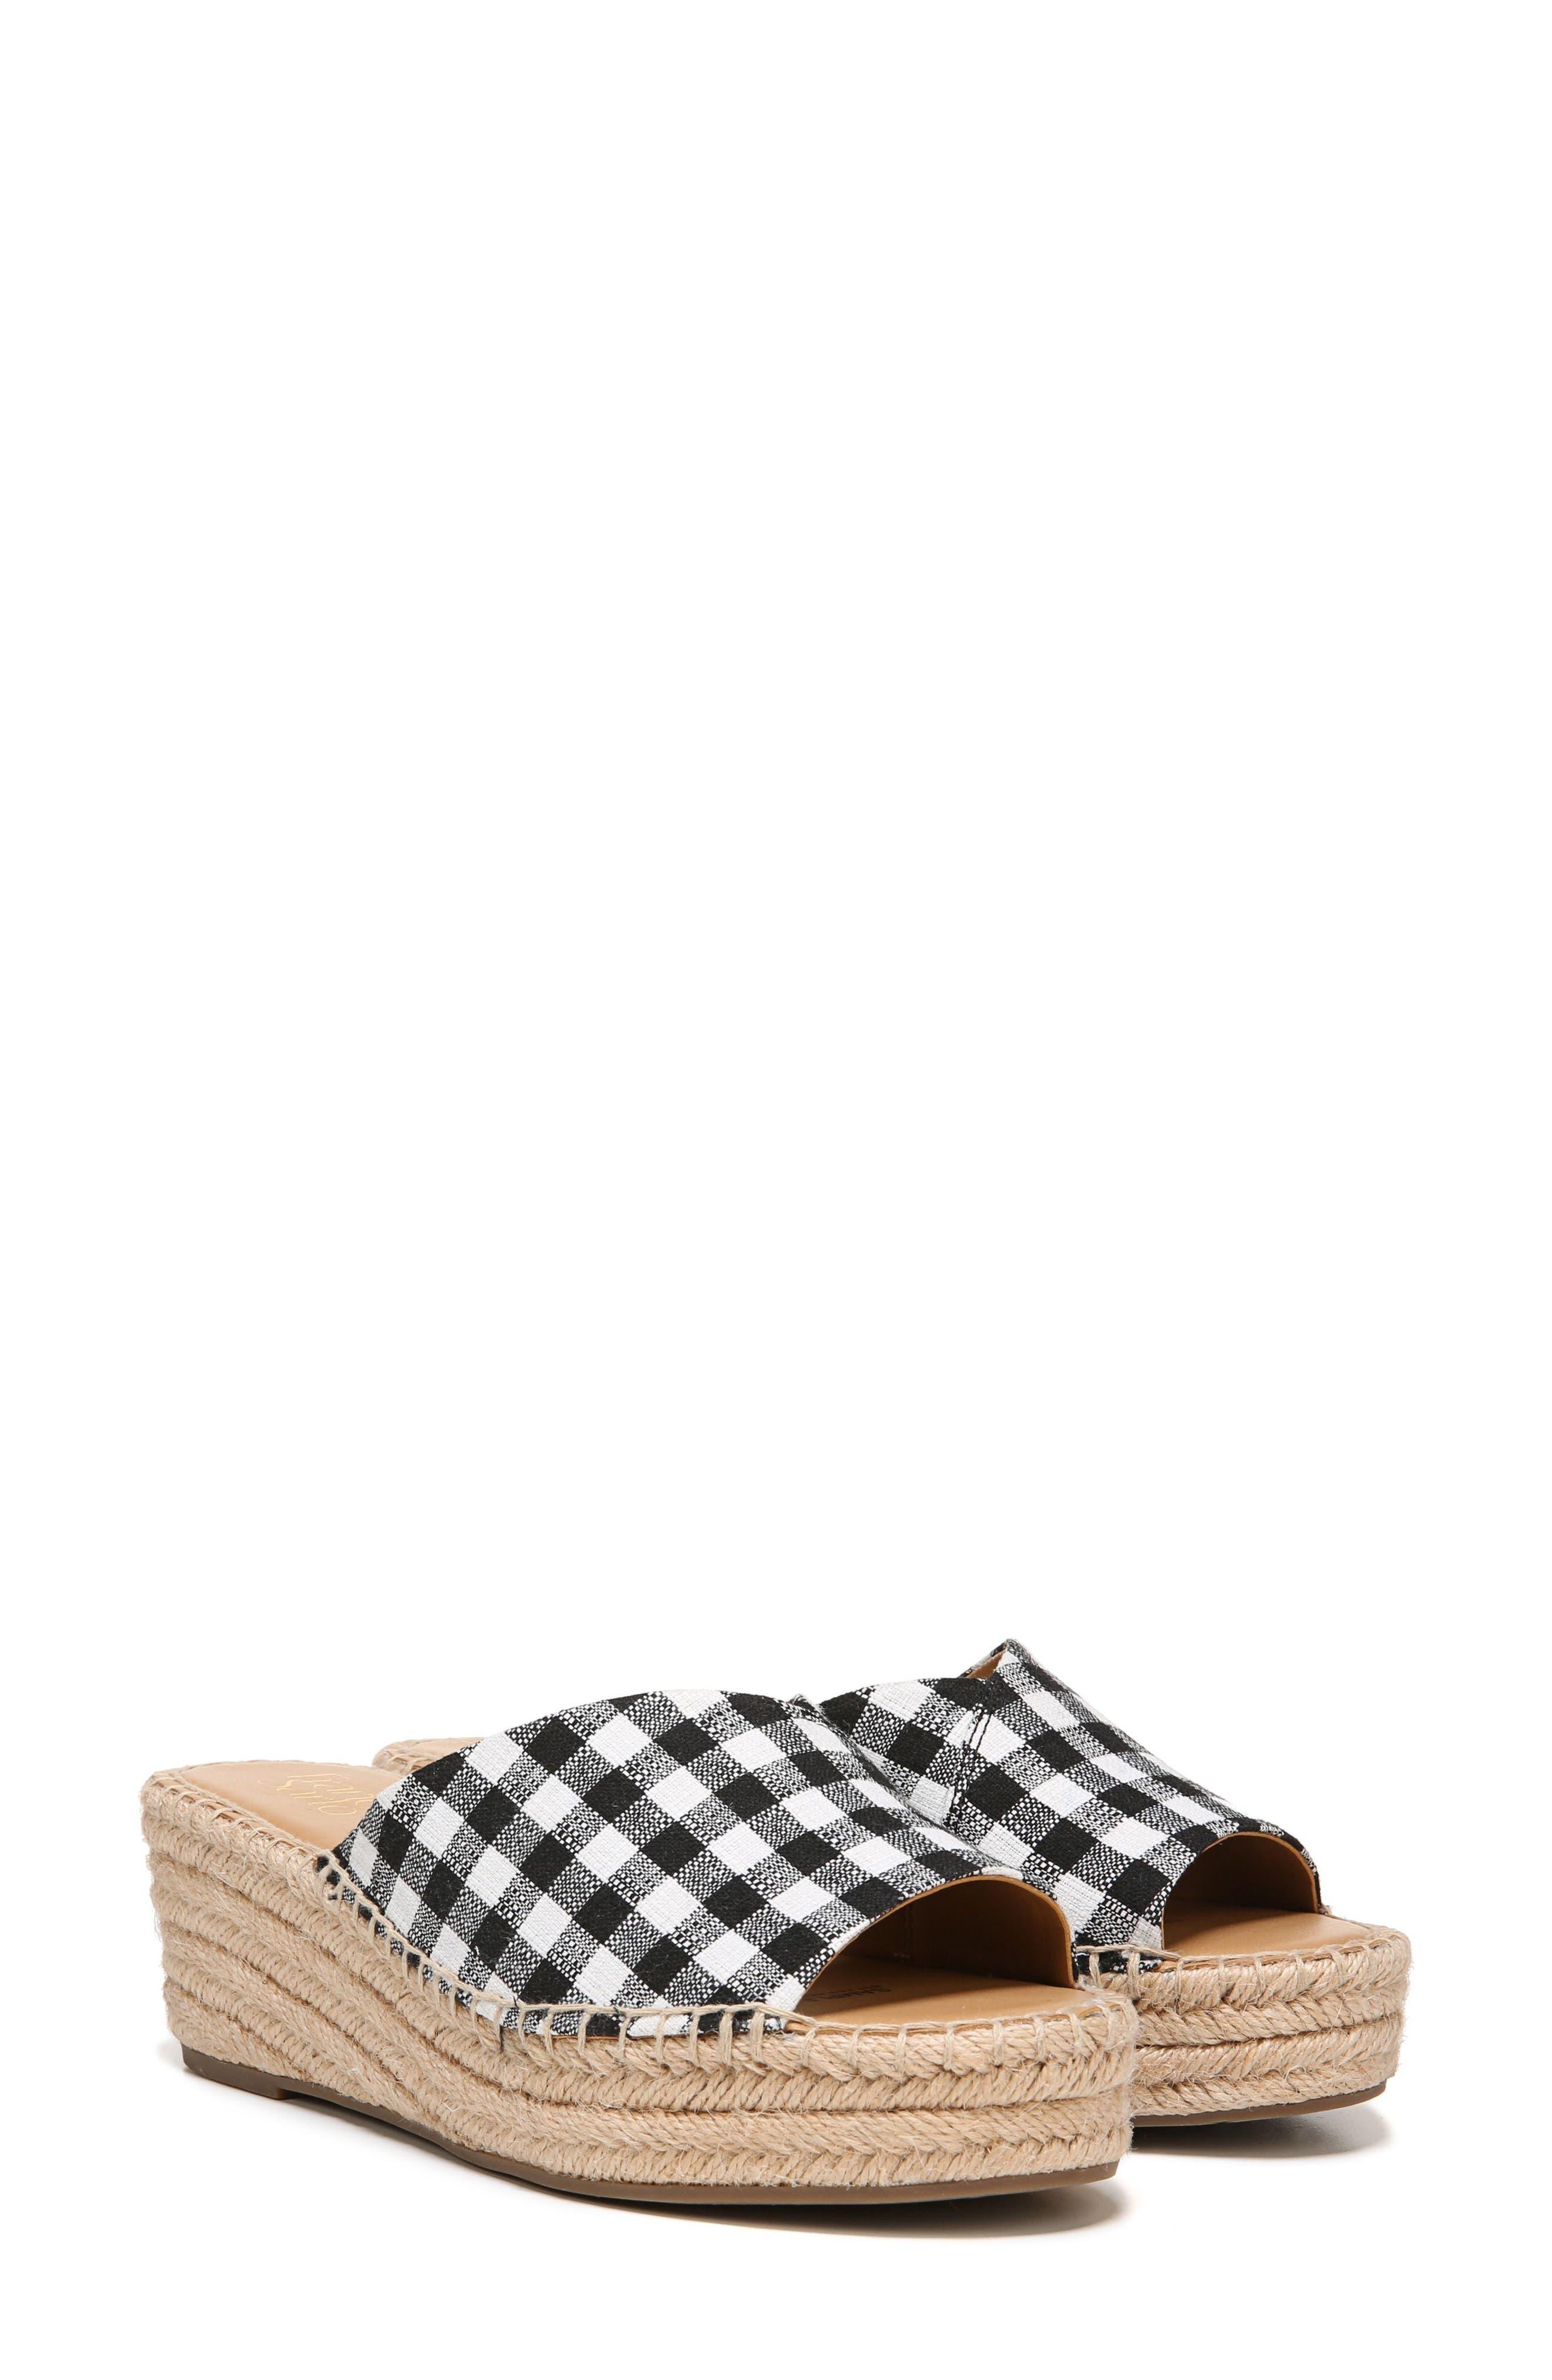 SARTO by Franco Sarto Pinot Platform Wedge Slide Sandal,                         Main,                         color, BLACK/ WHITE